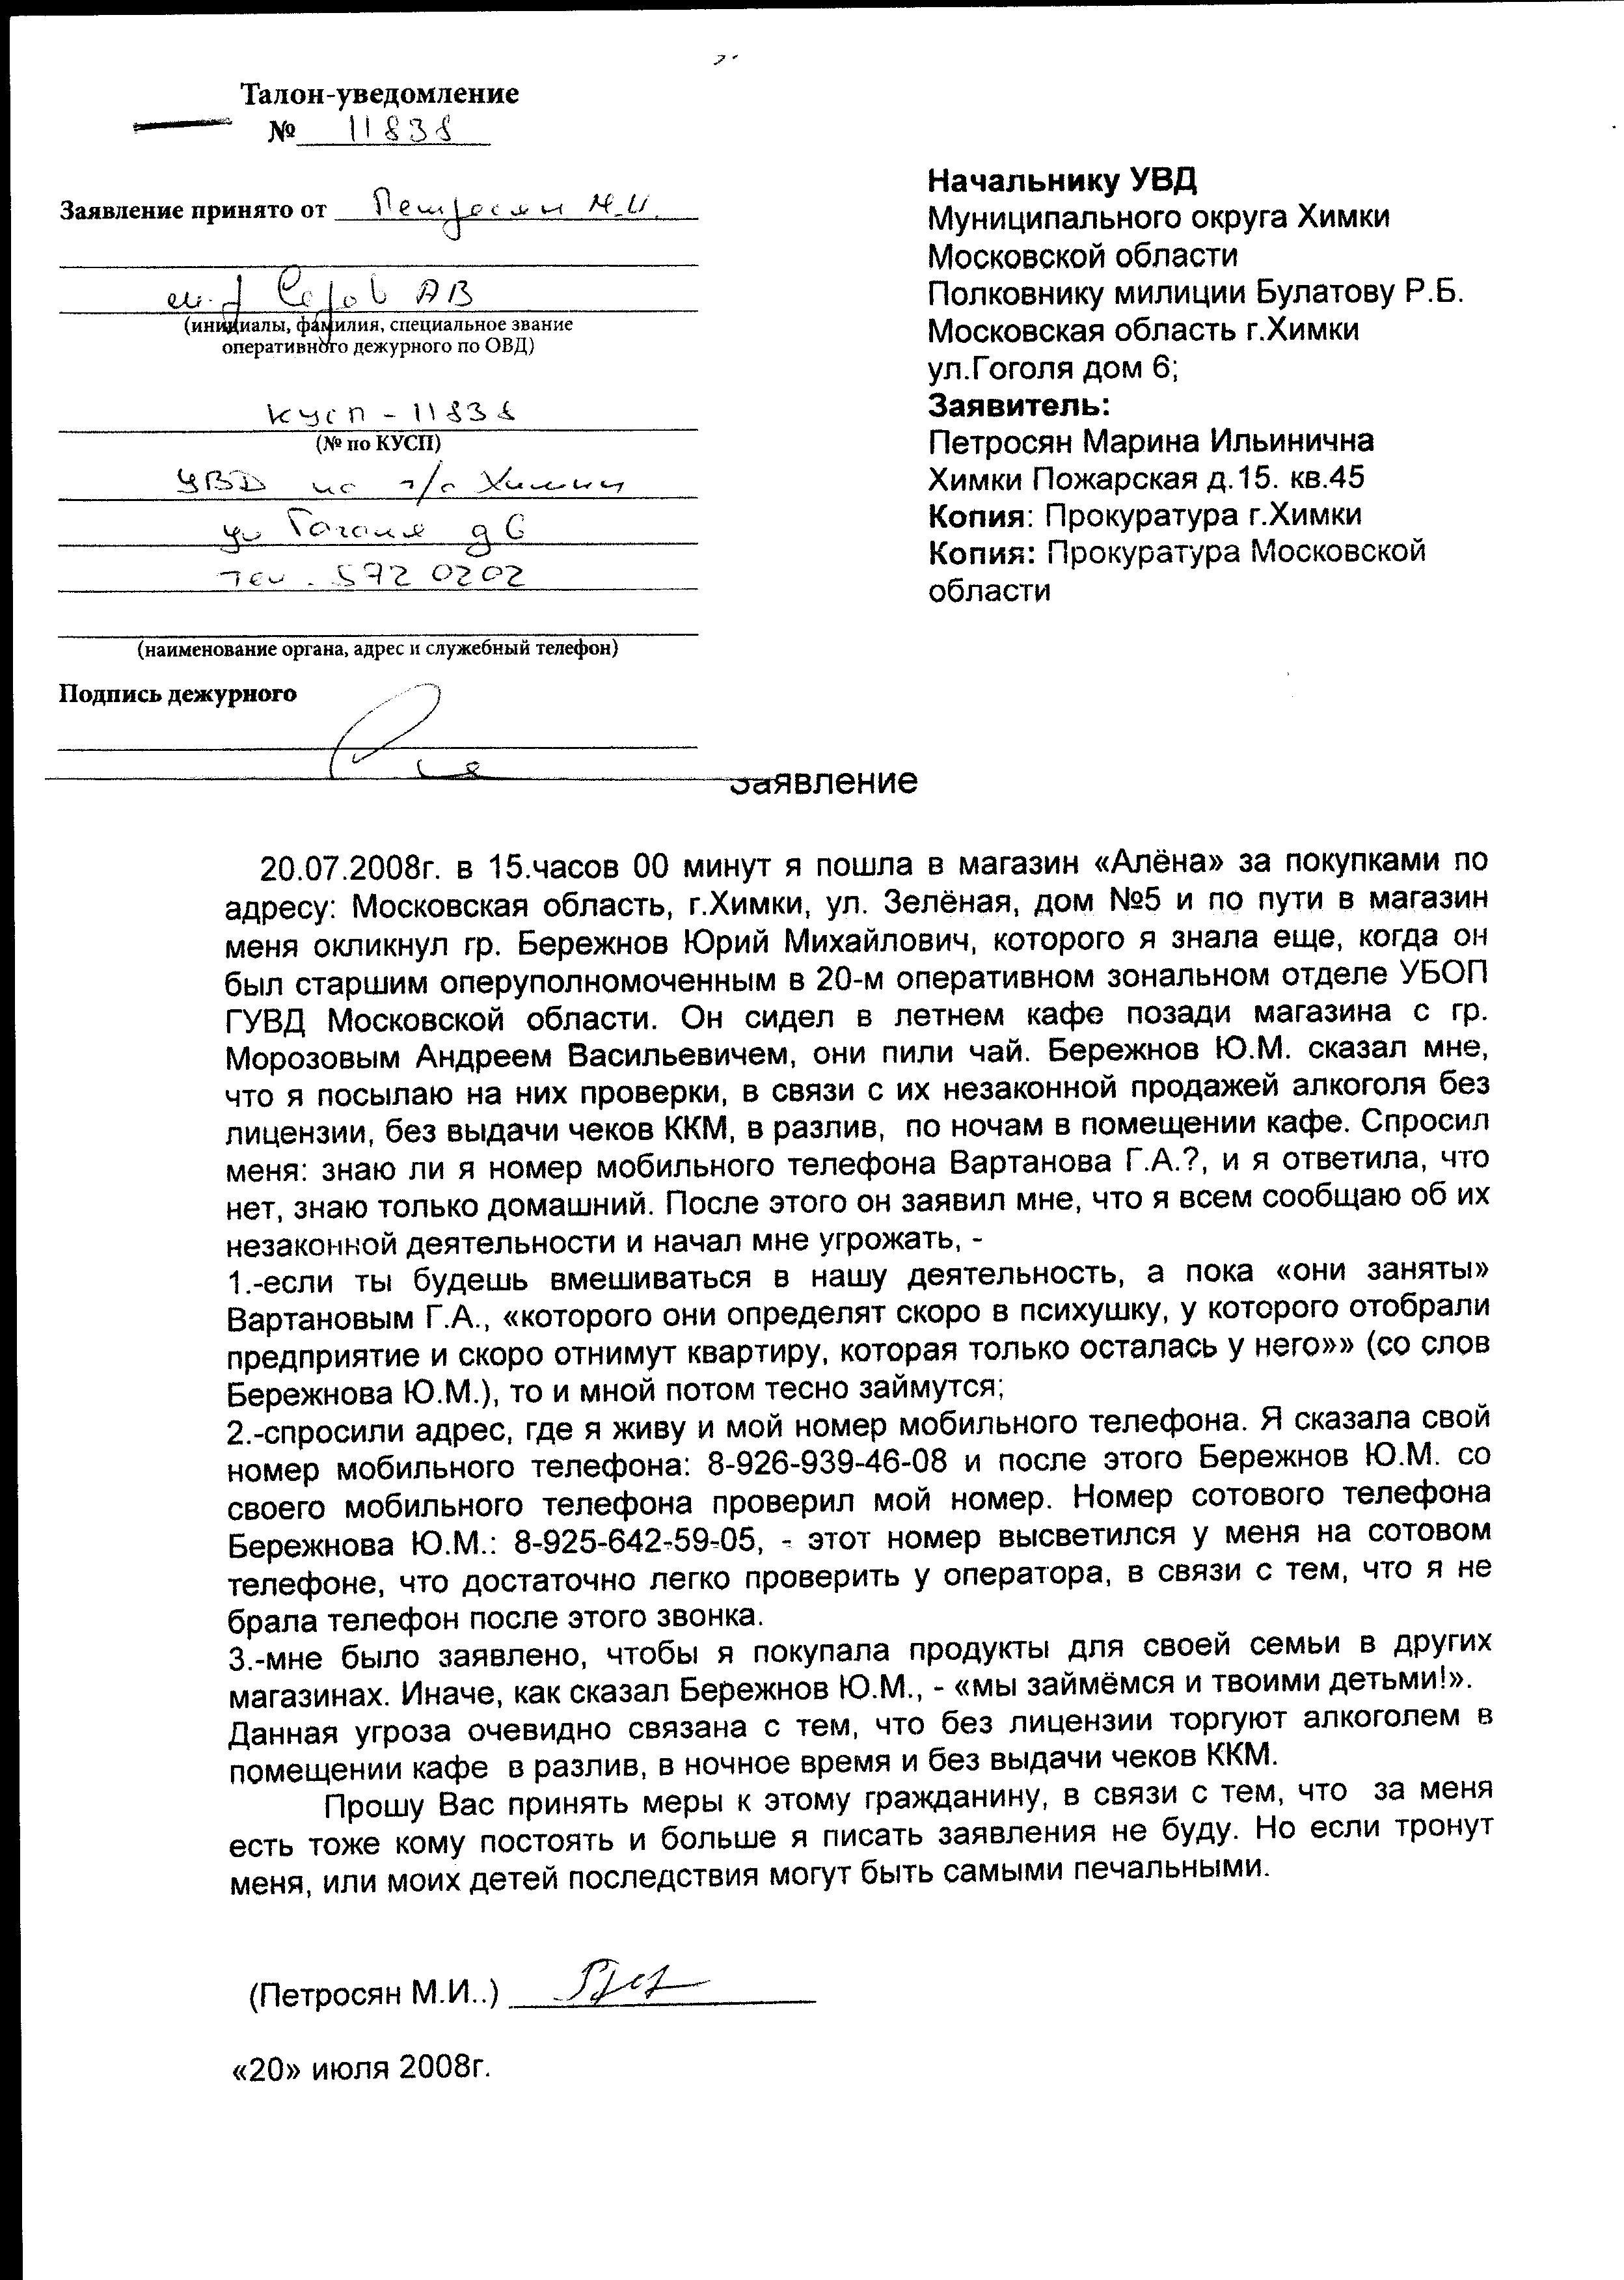 Заявление Петросян в УВД Сканер